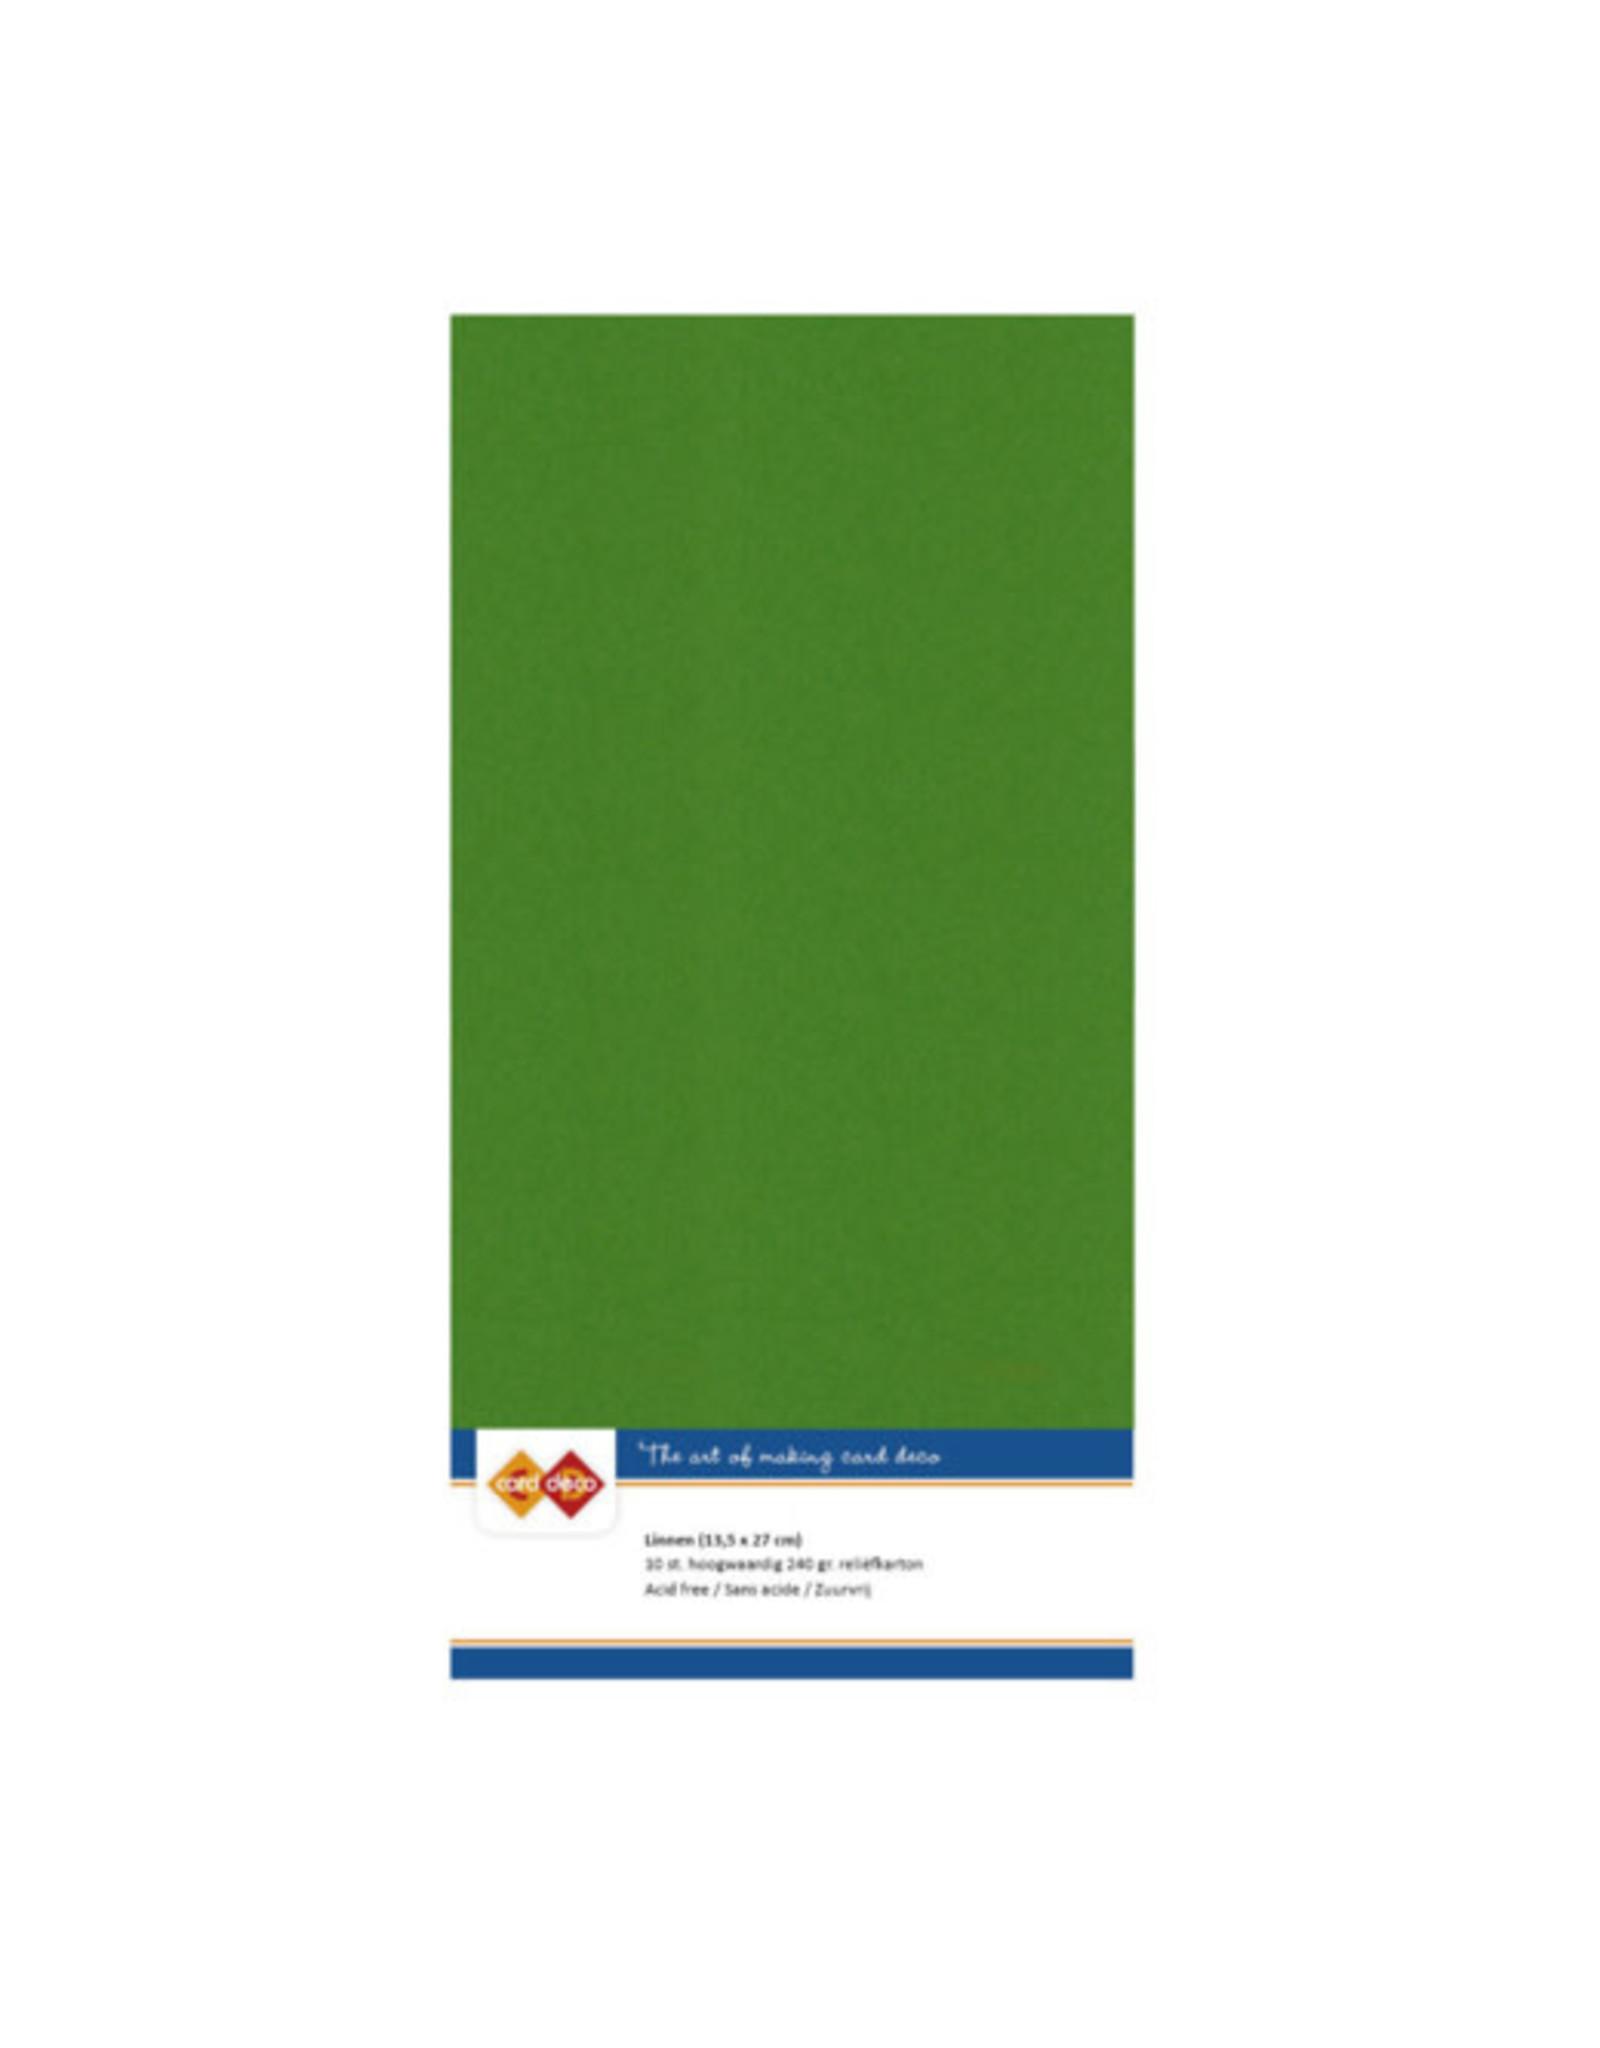 Card Deco Card Deco essentials Linnenkarton - Vierkant - fern green